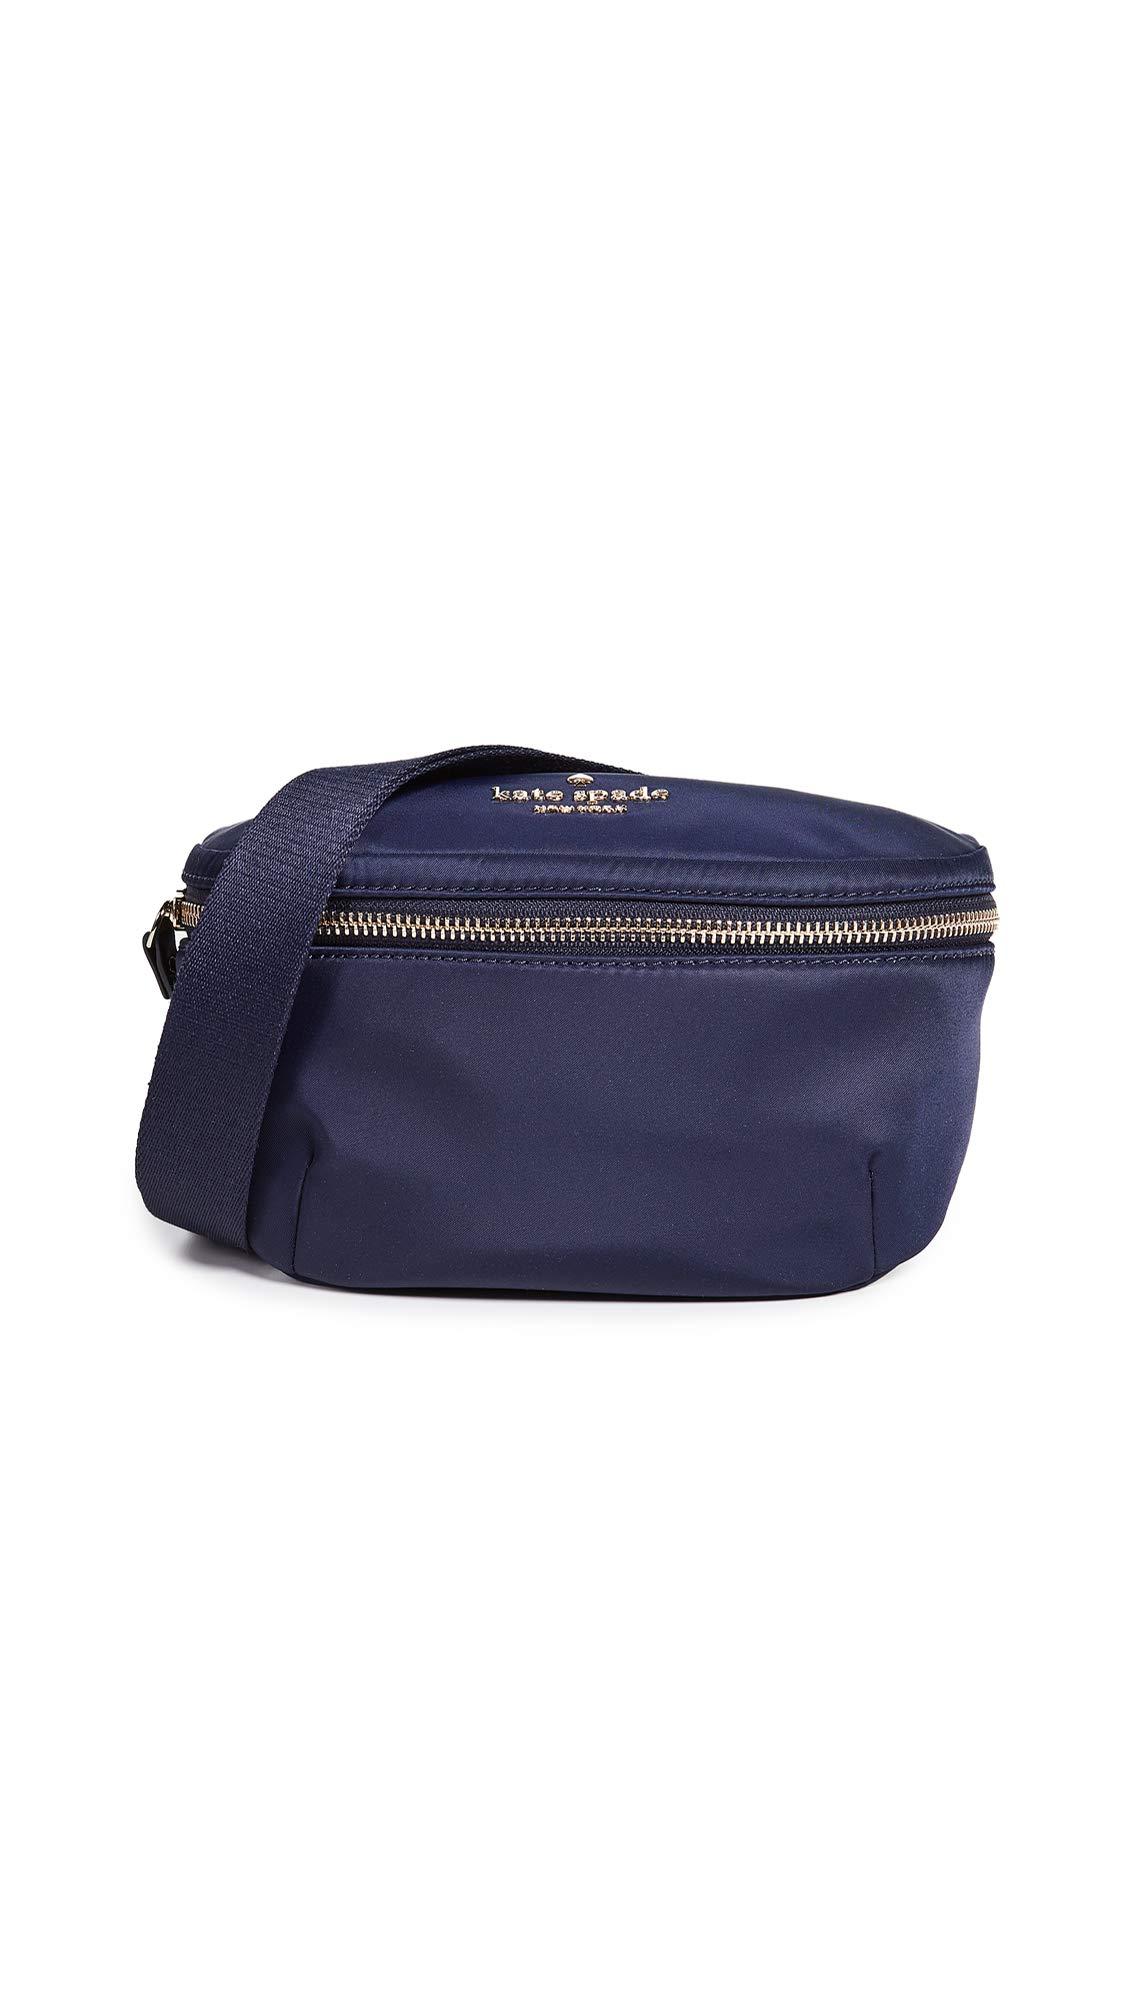 Kate Spade New York Women's Watson Lane Betty Belt Bag, Navy, Blue, One Size